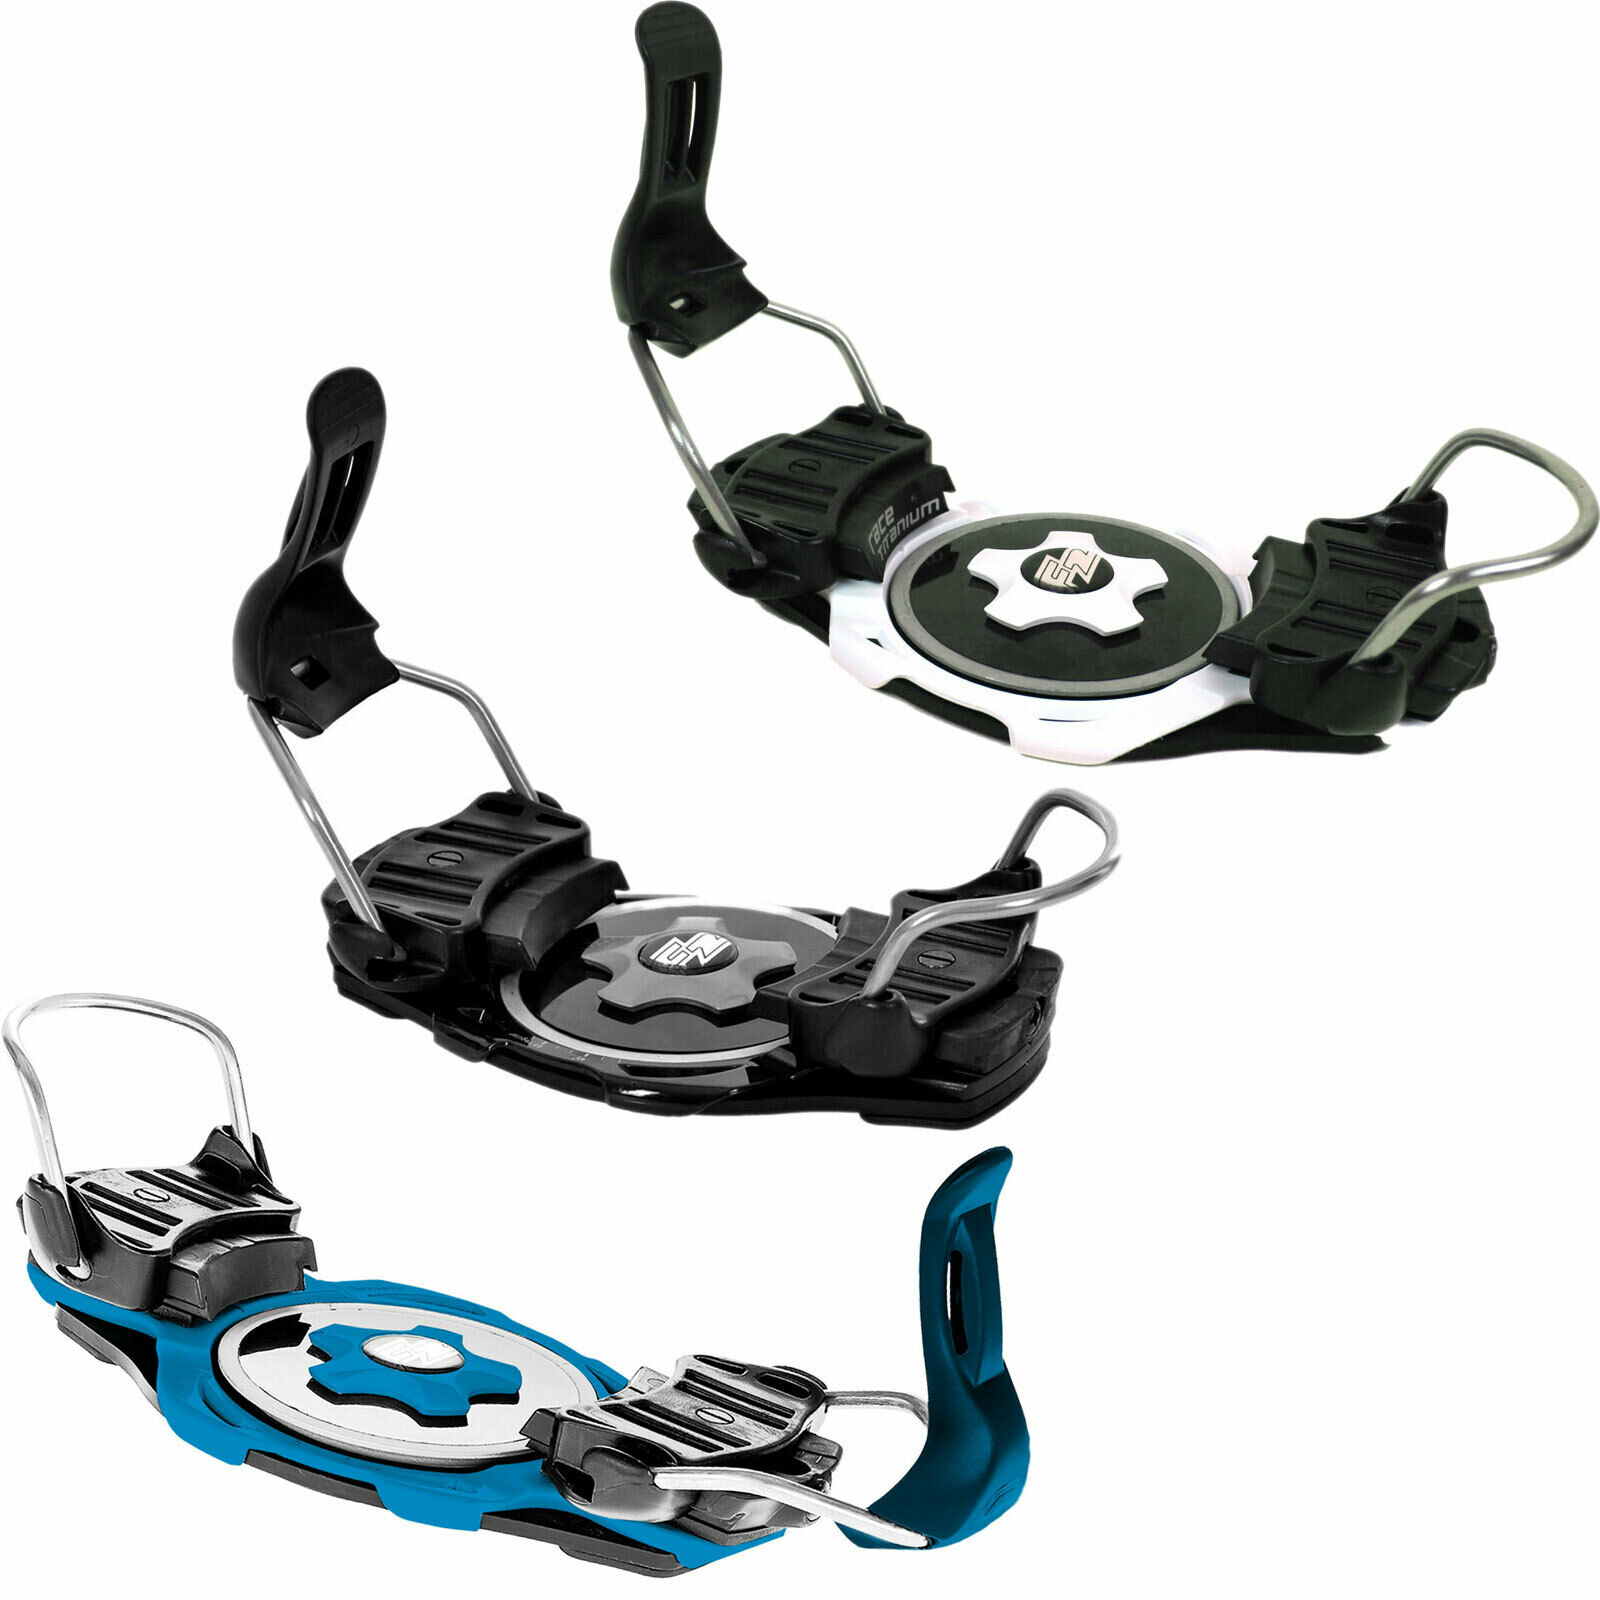 F2 Race Titanium Binding Curved  Snowboard Hardboot raceboardbindung NEW  affordable